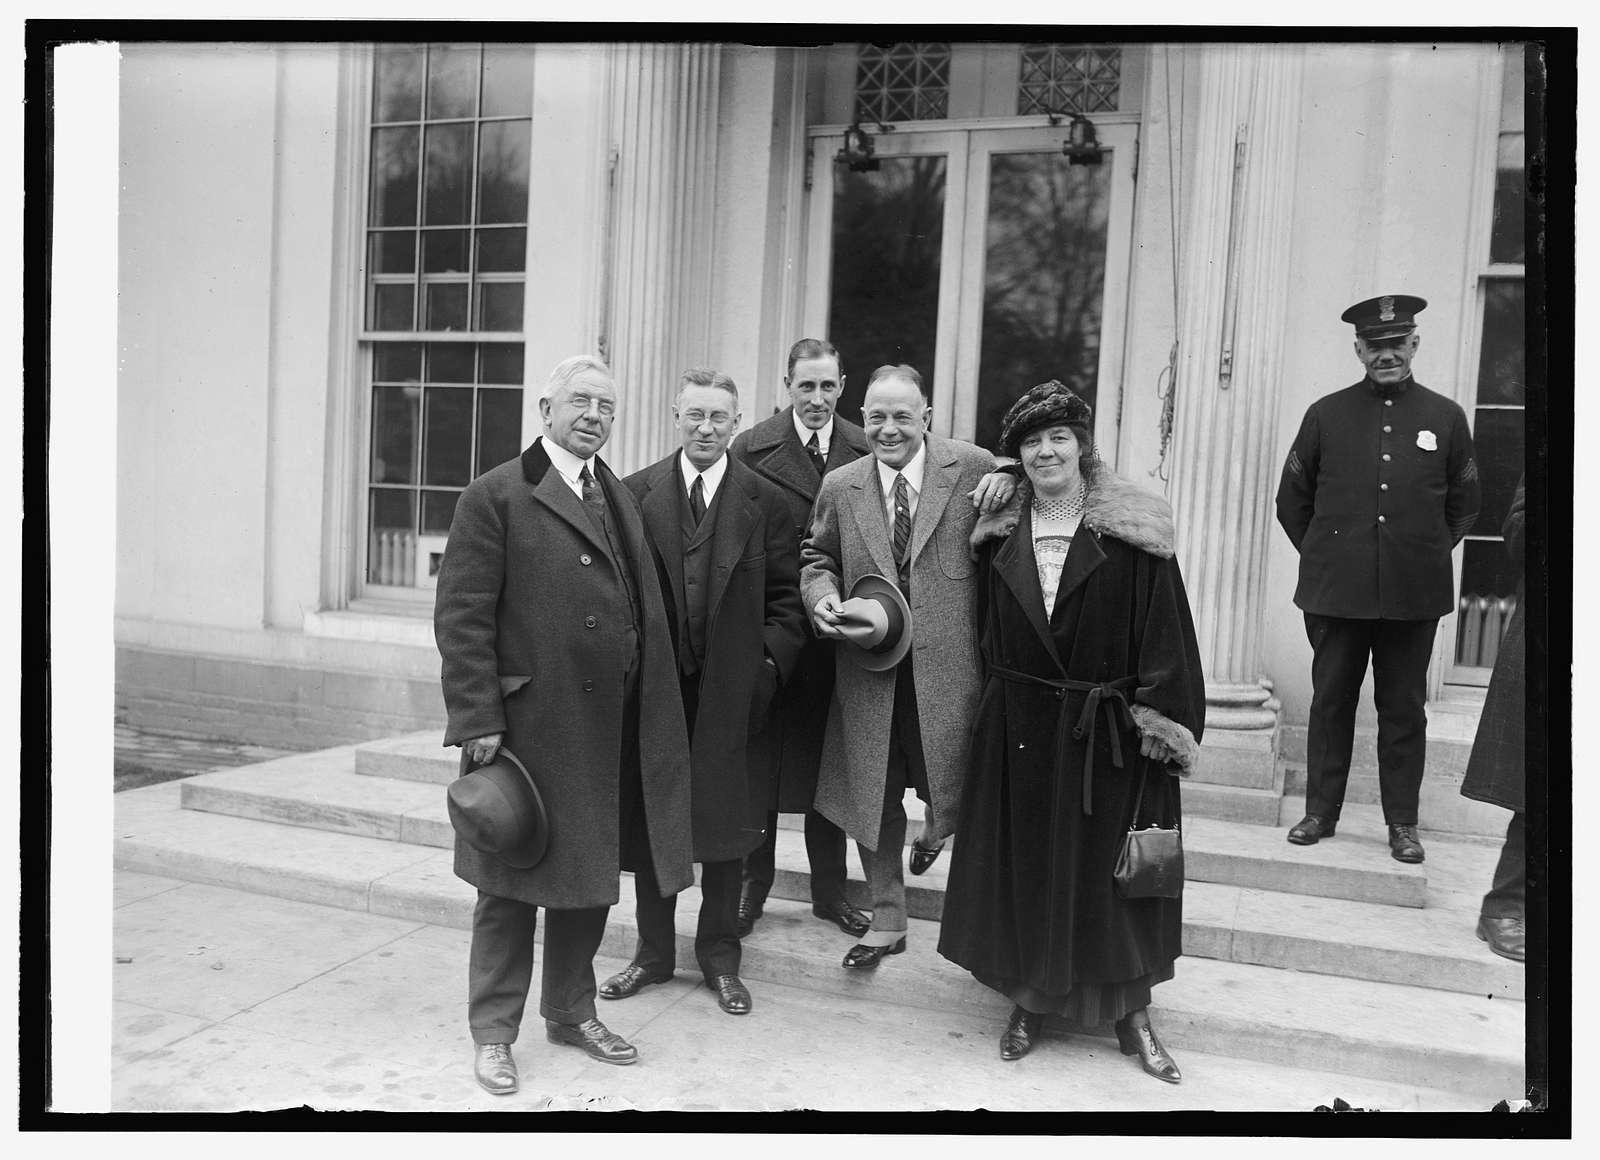 Billy Sunday at White House